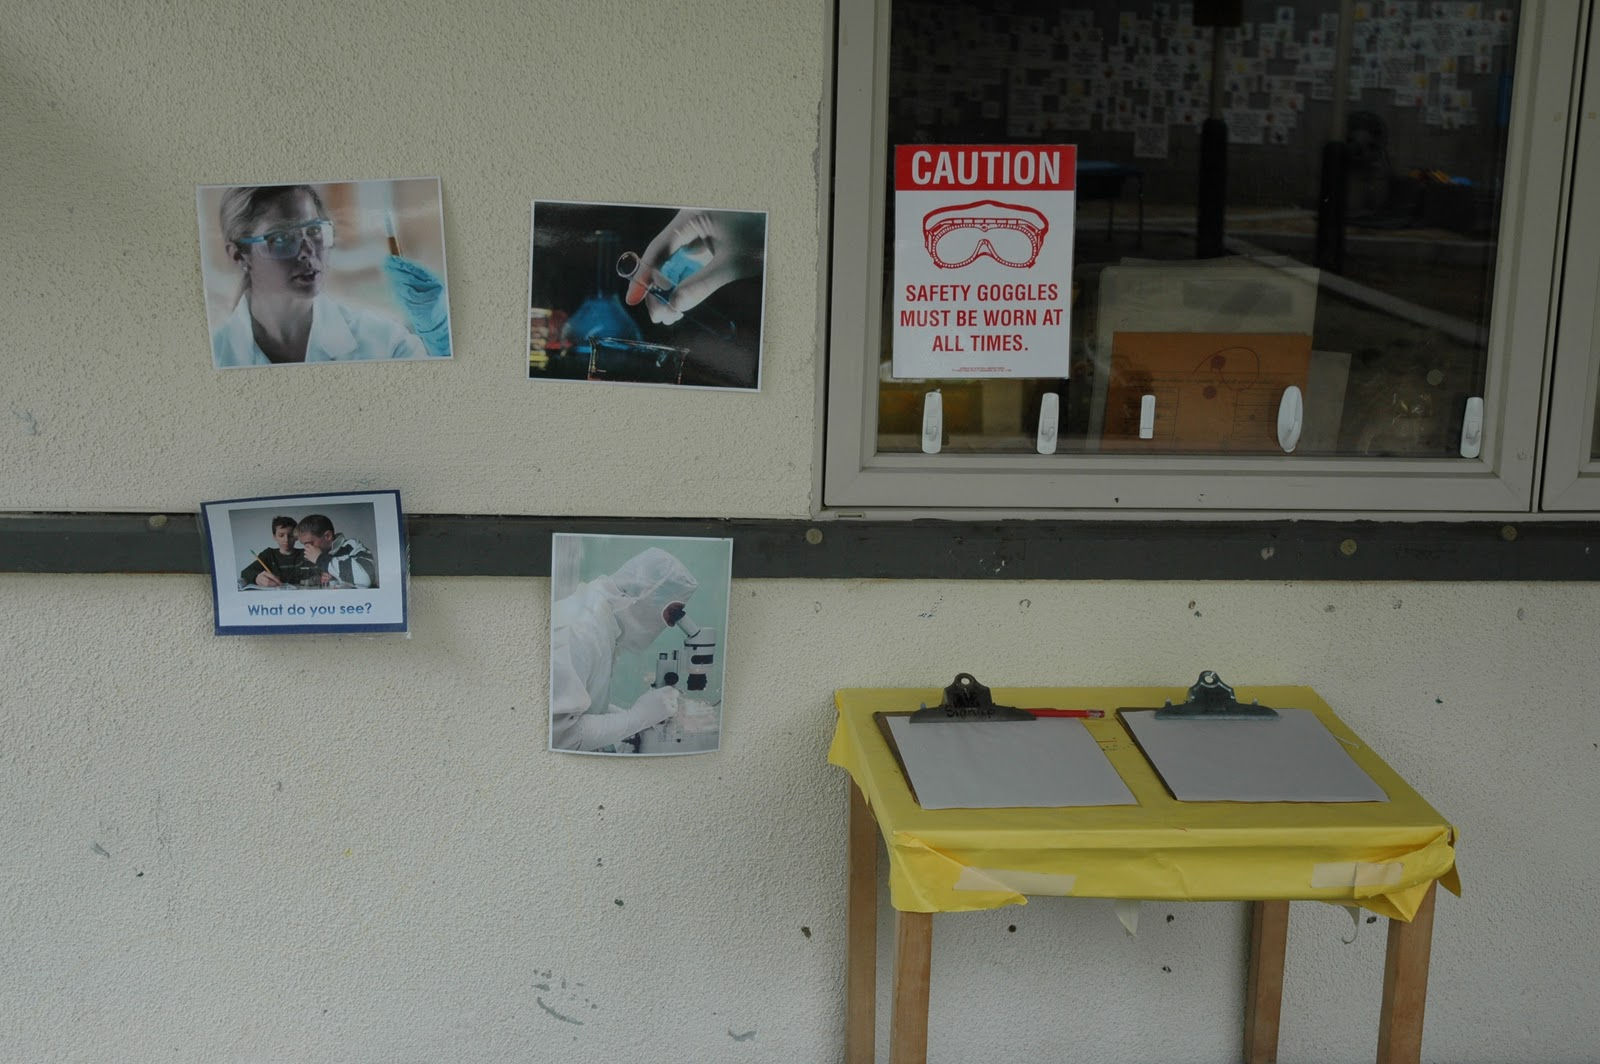 Outdoor Classroom Ideas Uk : Exploring the outdoor classroom paleontology preschool